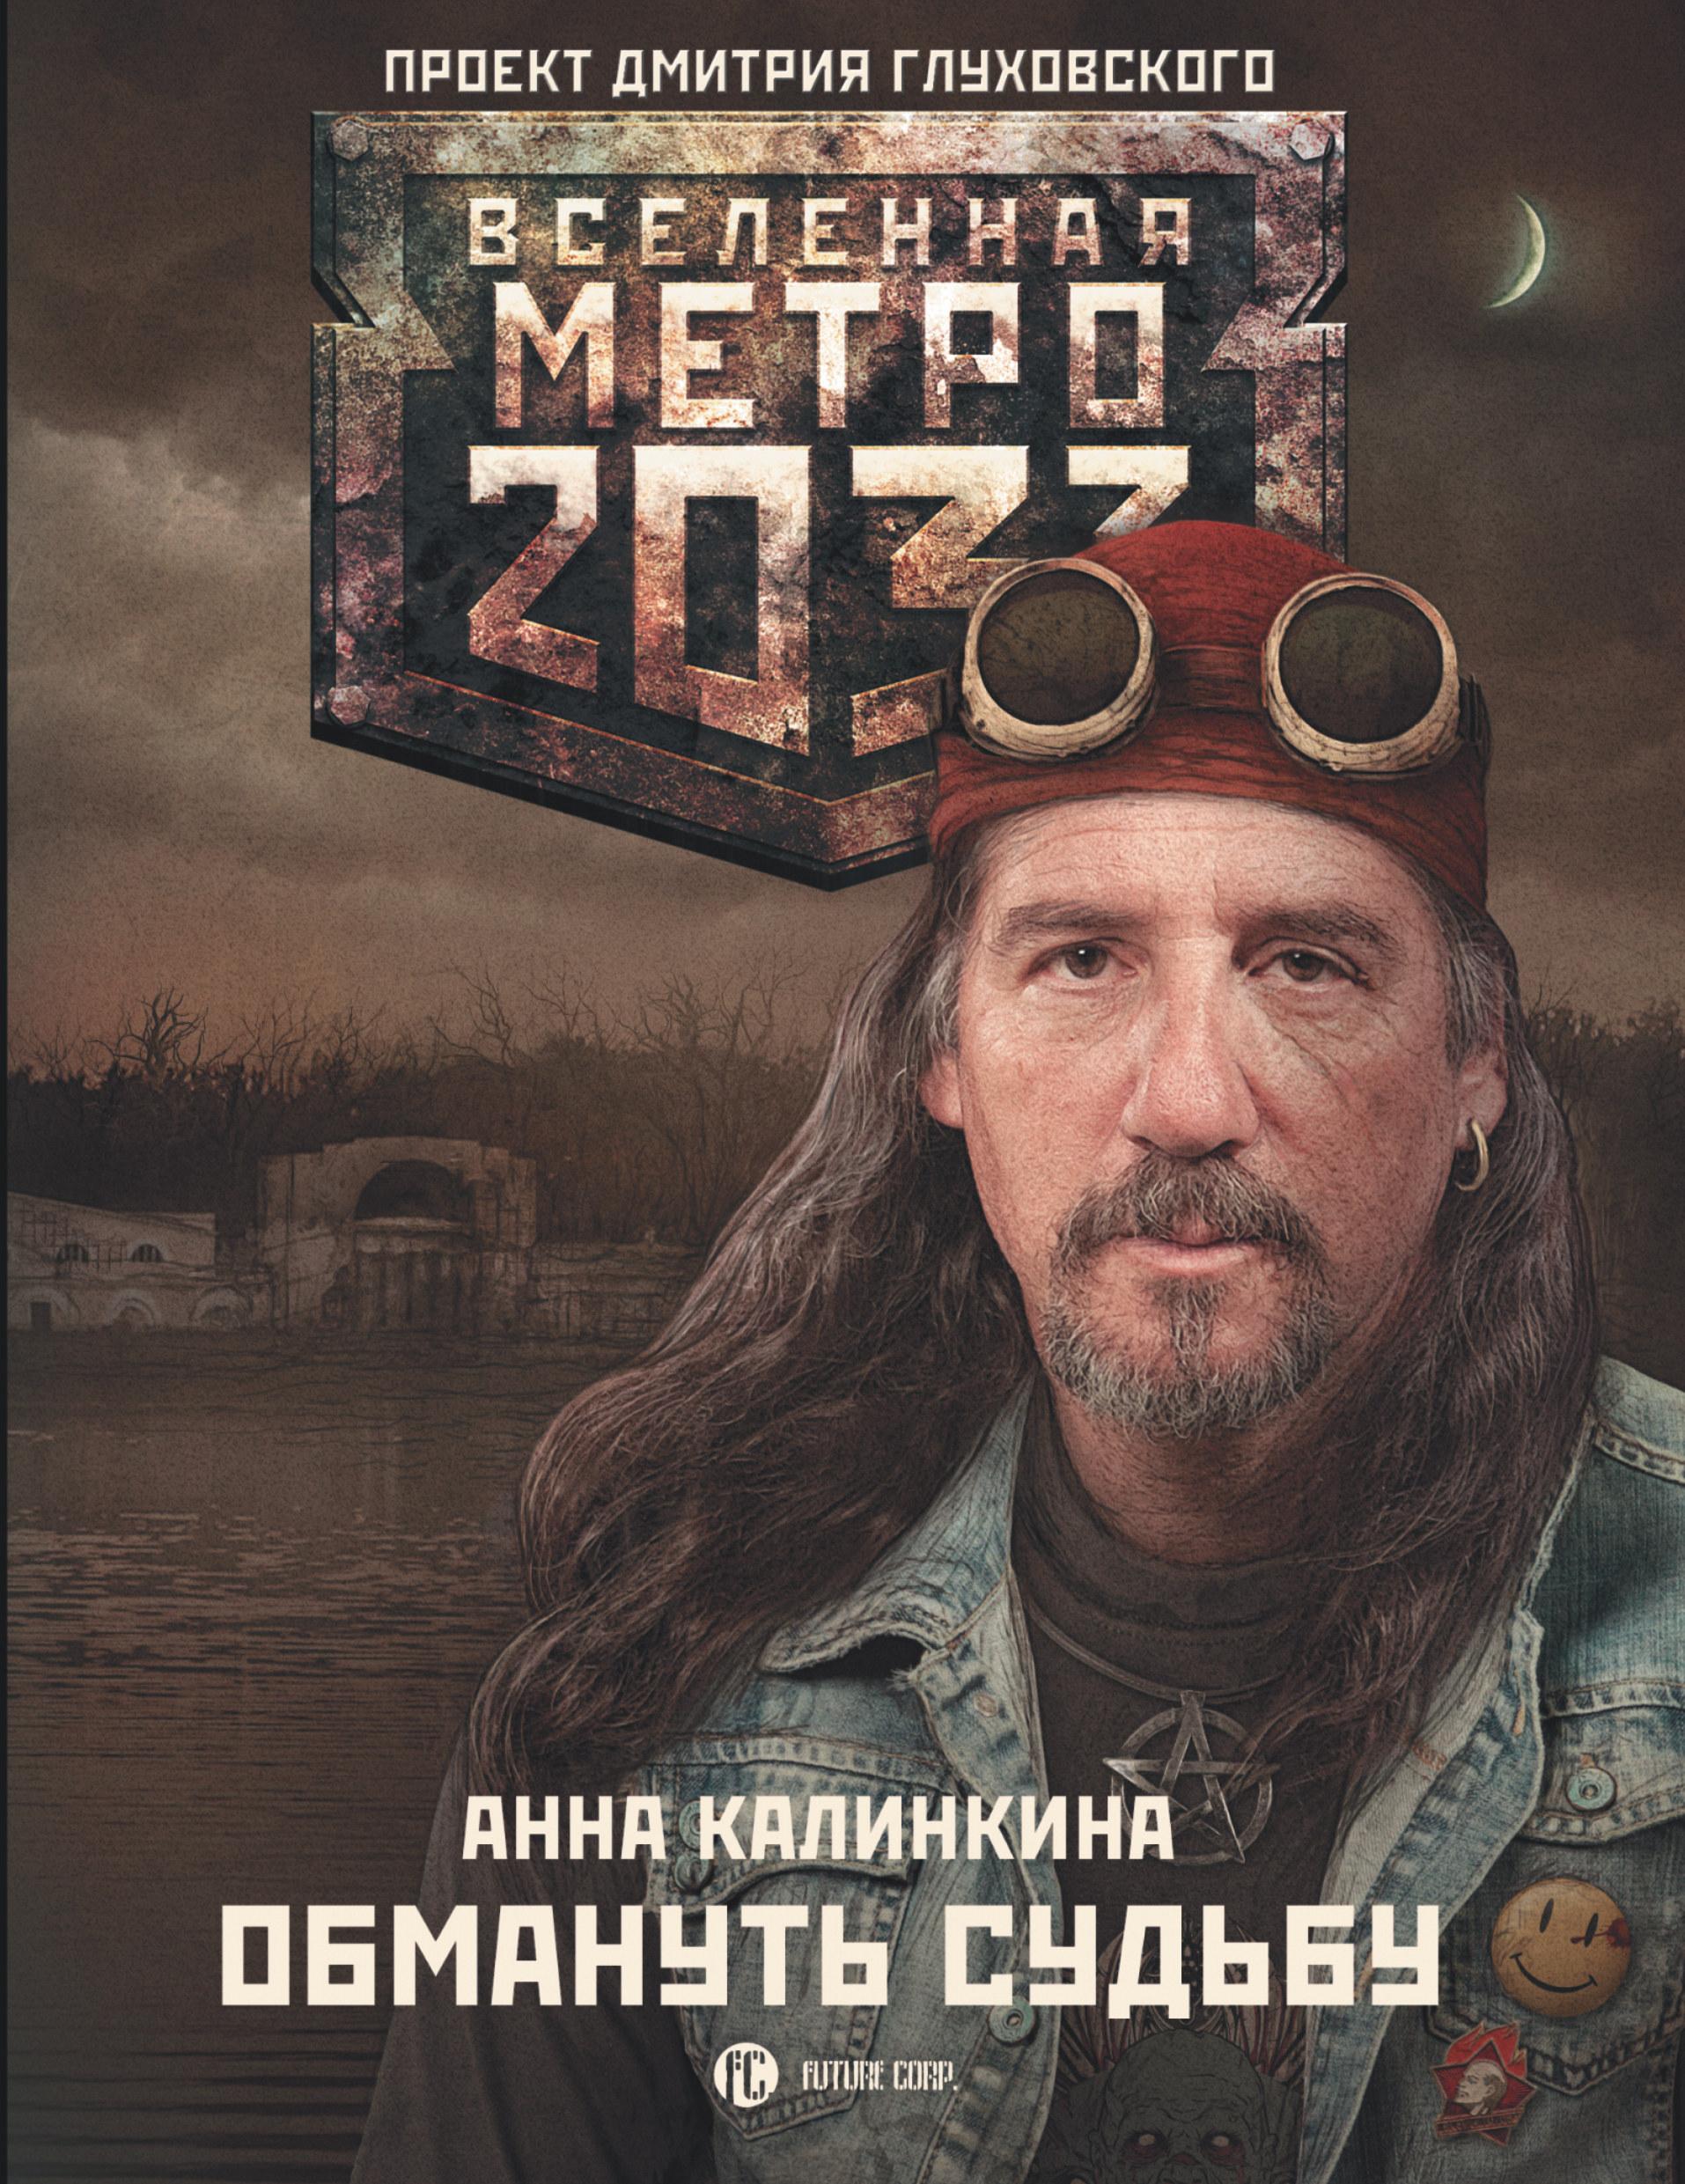 Анна Калинкина Метро 2033: Обмануть судьбу